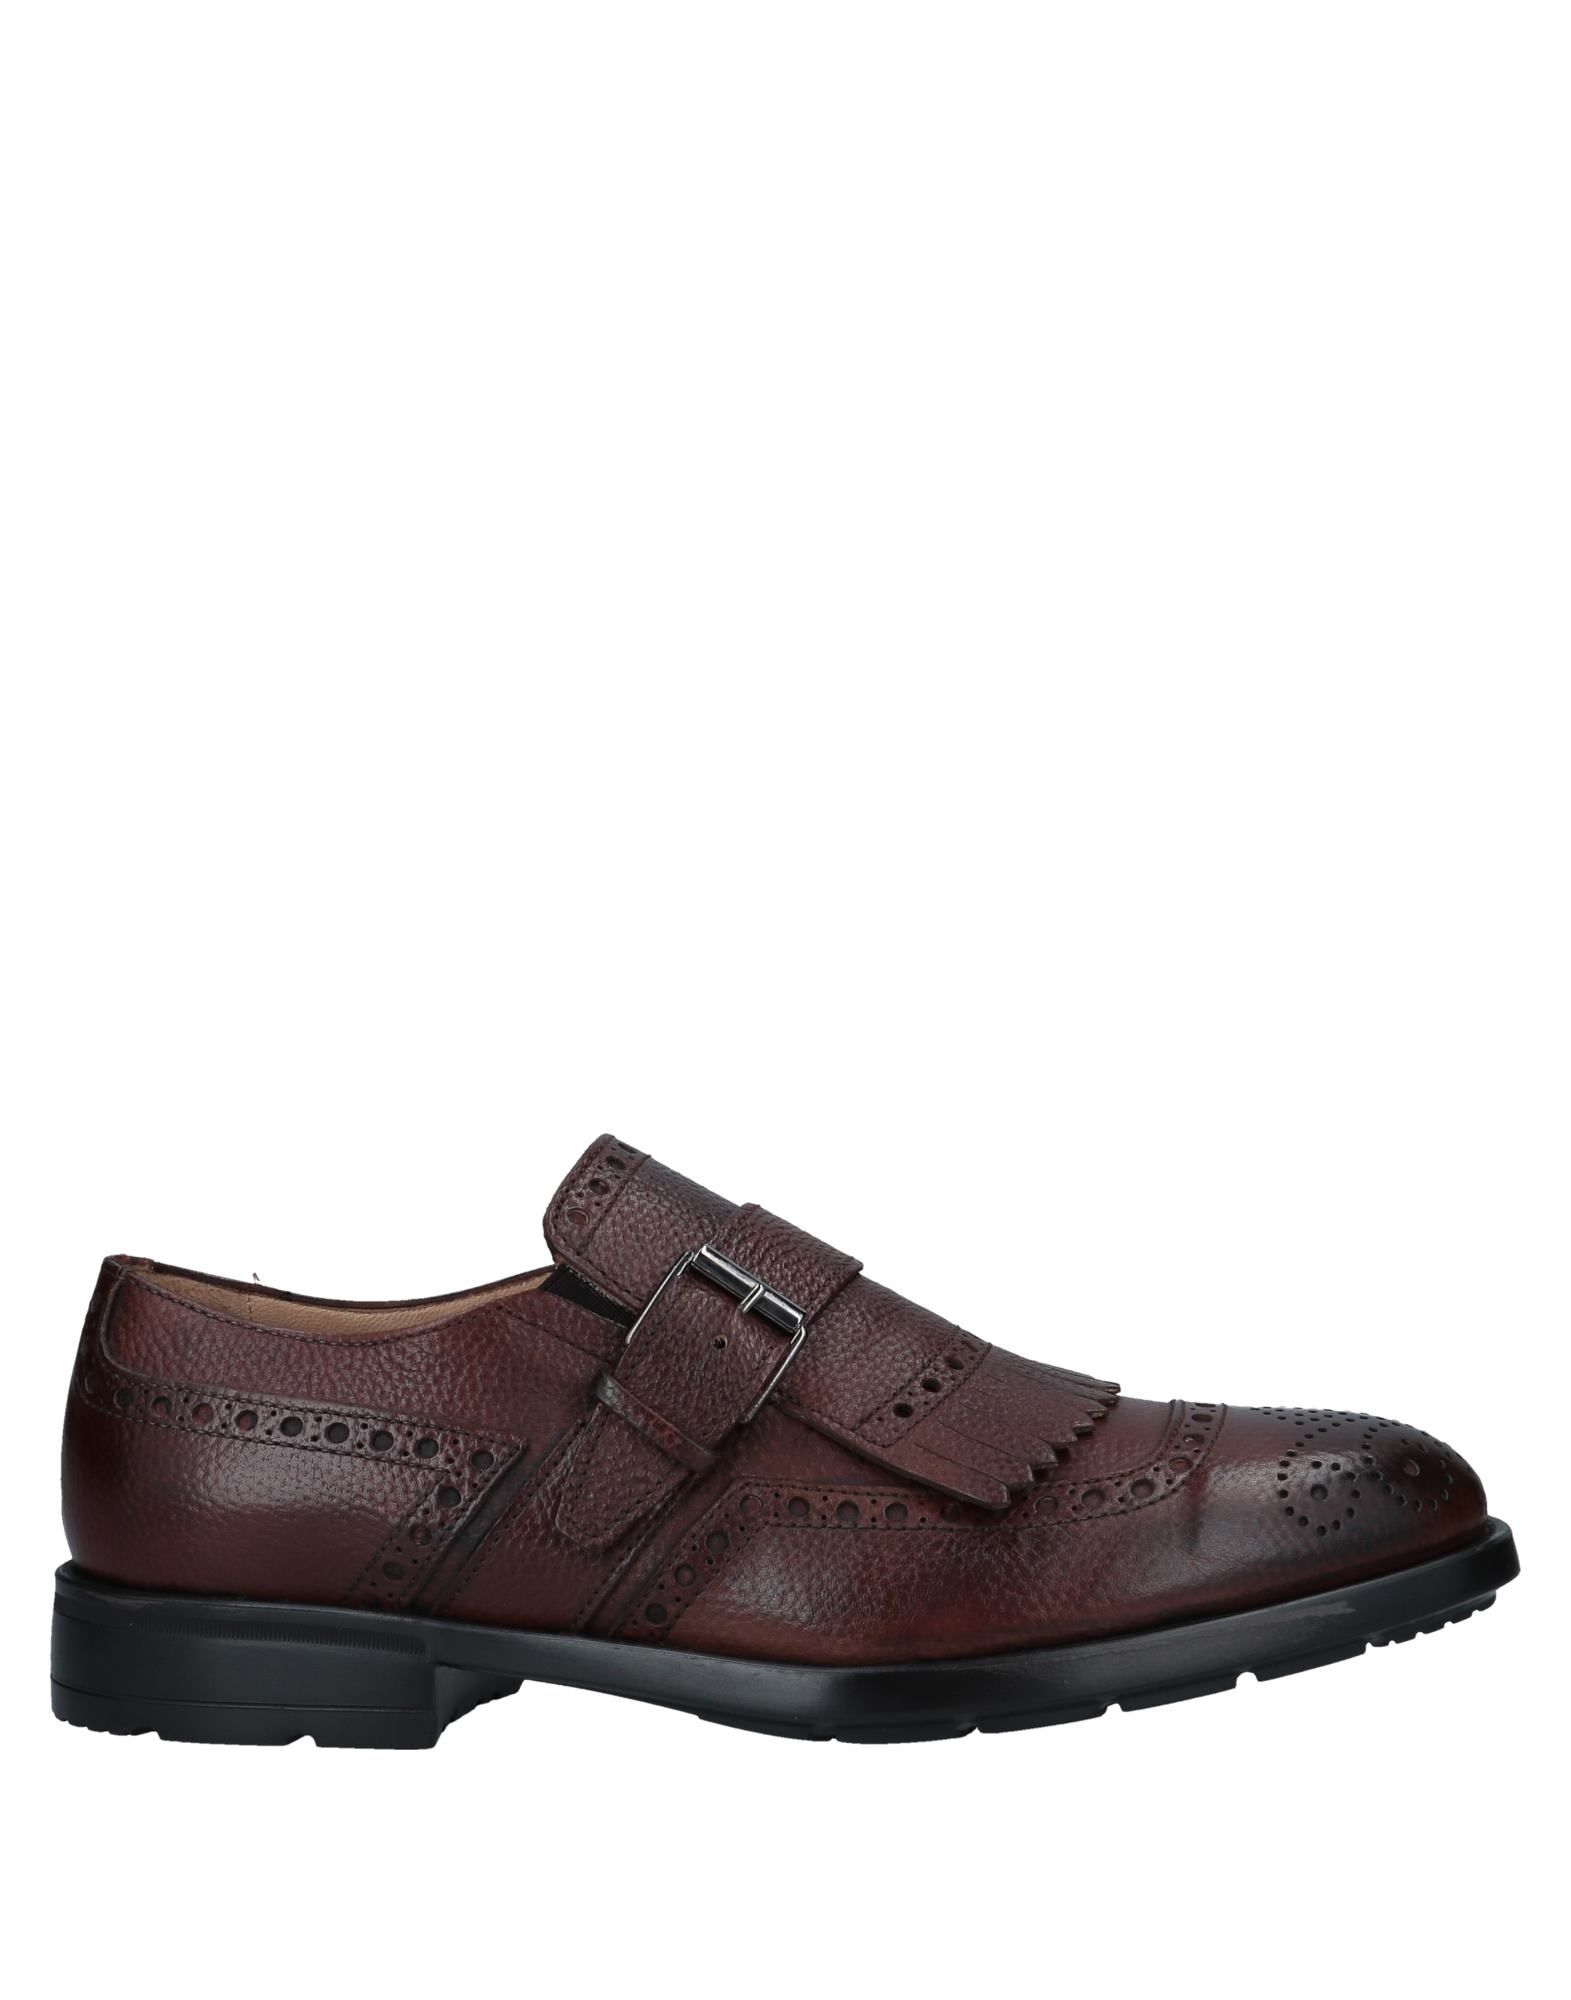 Baldinini Mokassins Herren  11554462LU Gute Qualität beliebte Schuhe